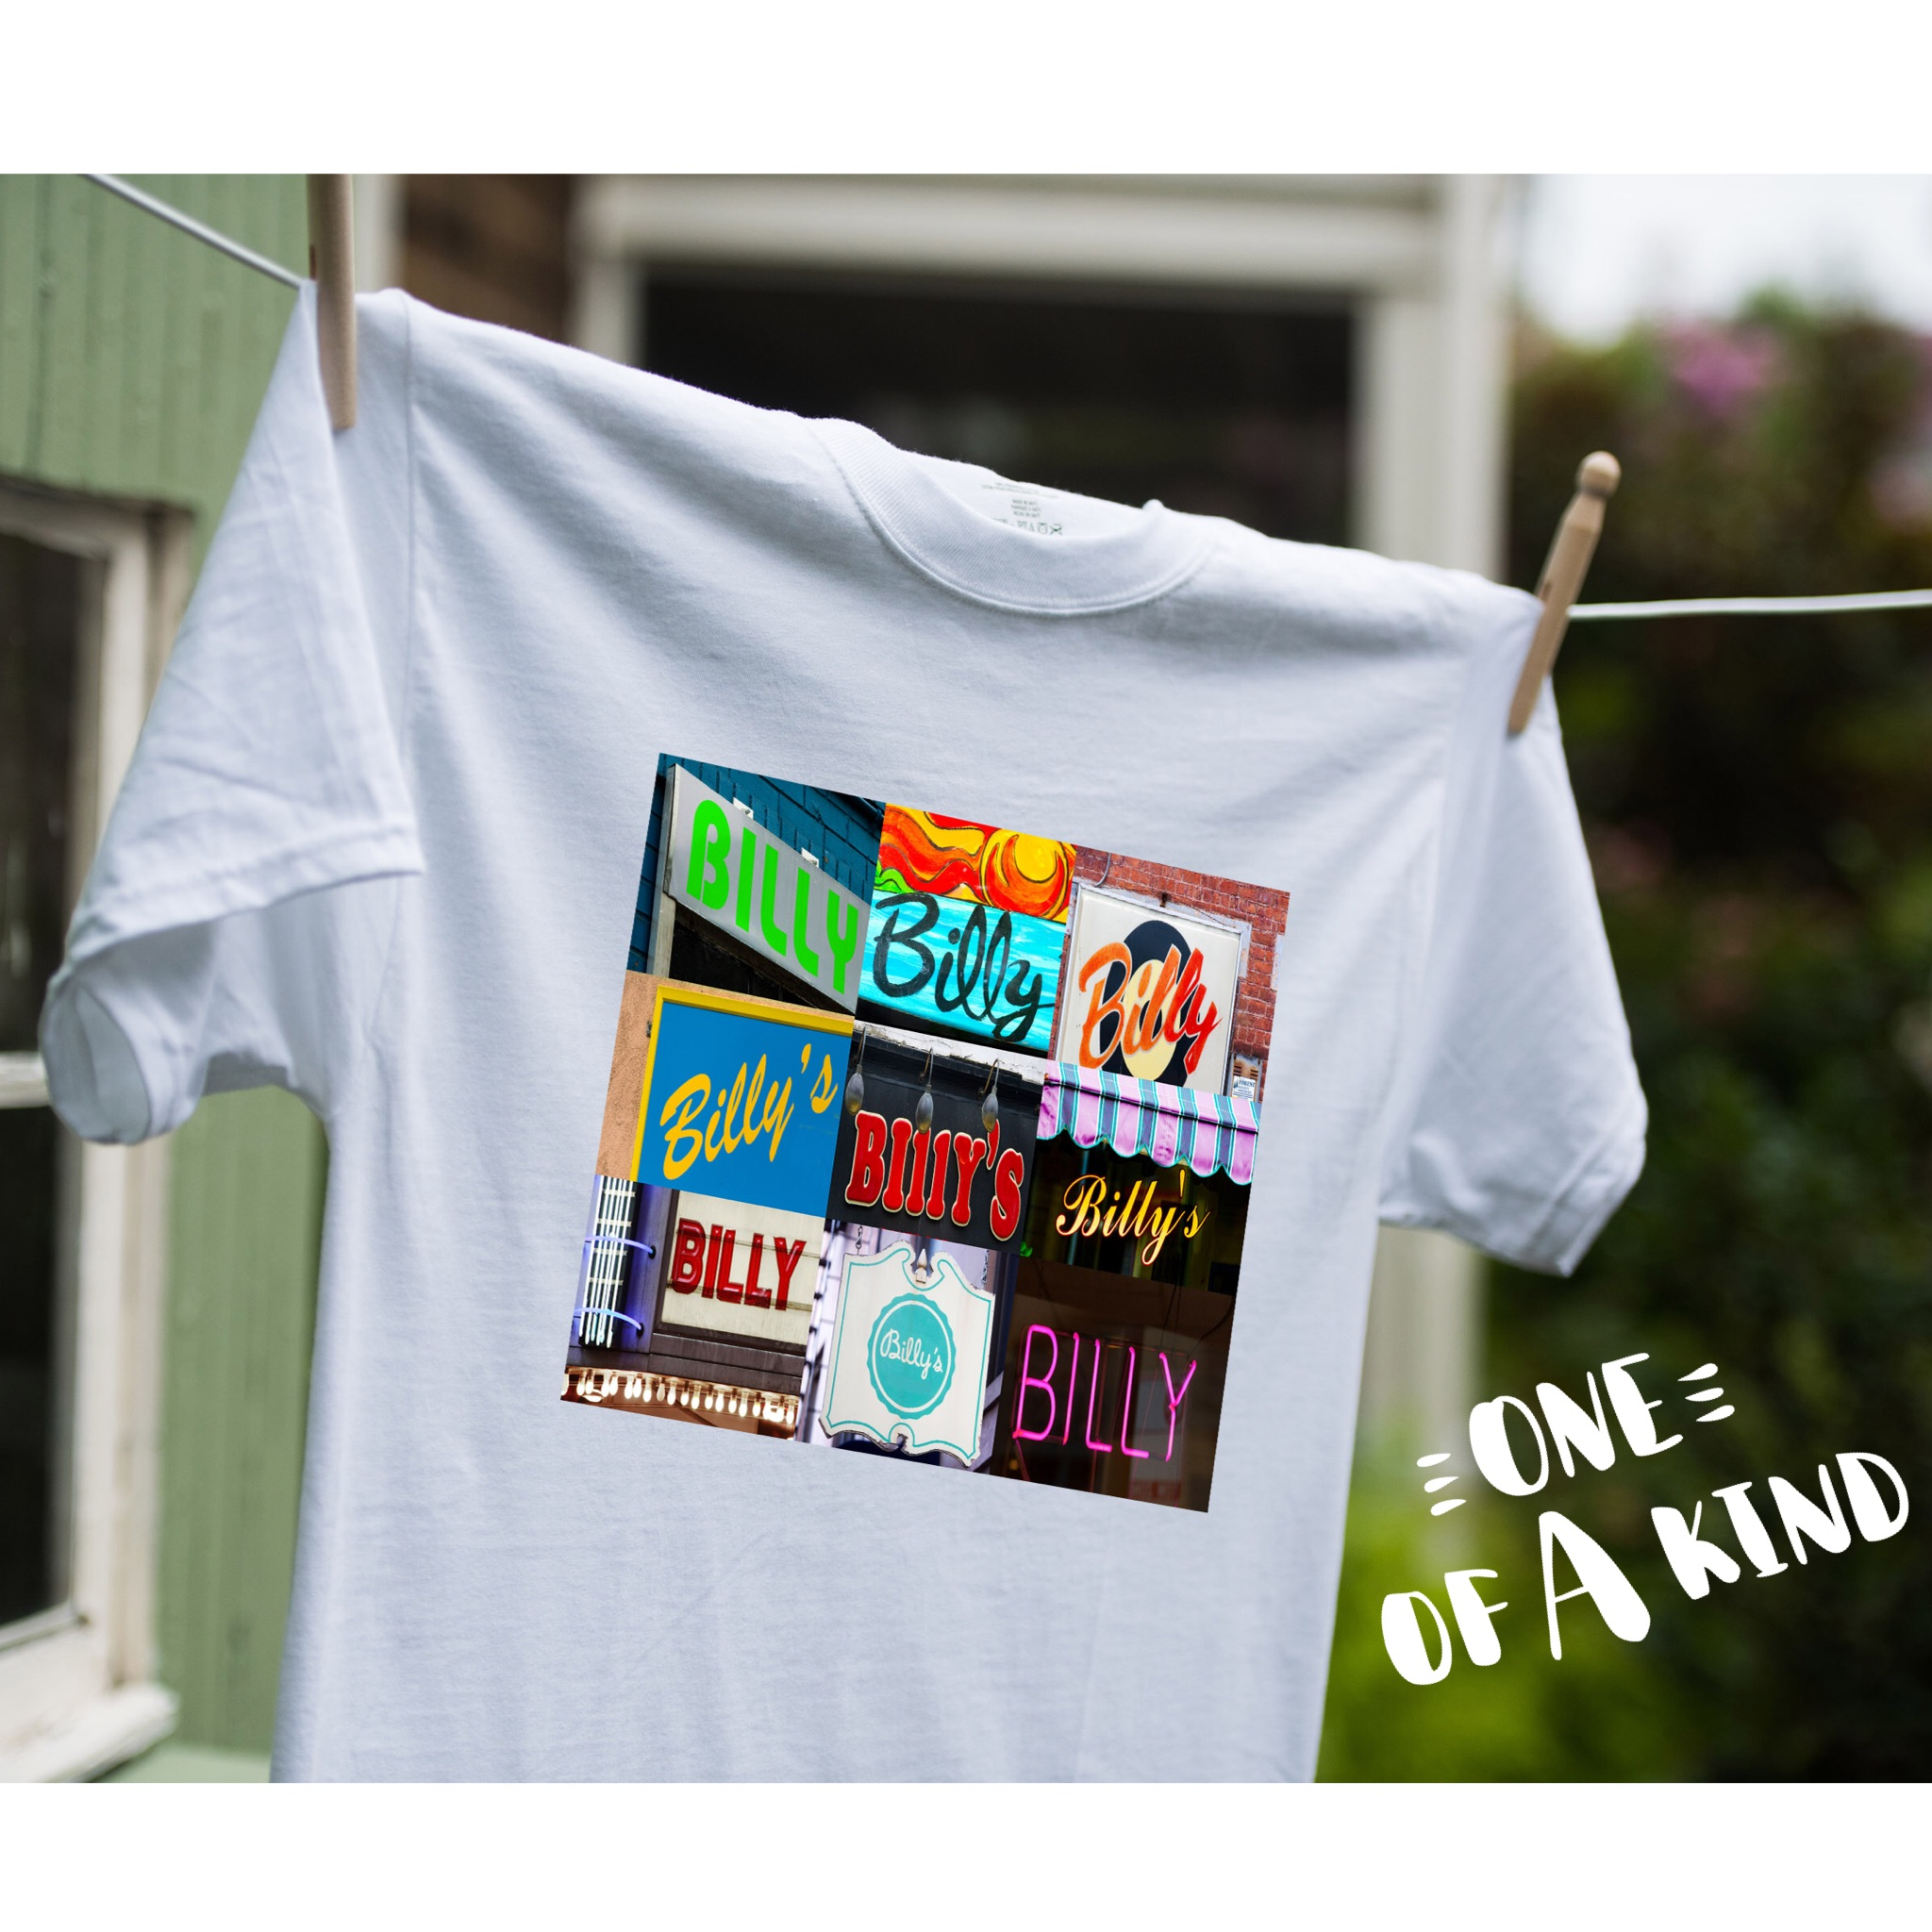 BillyT-shirtPost.jpg